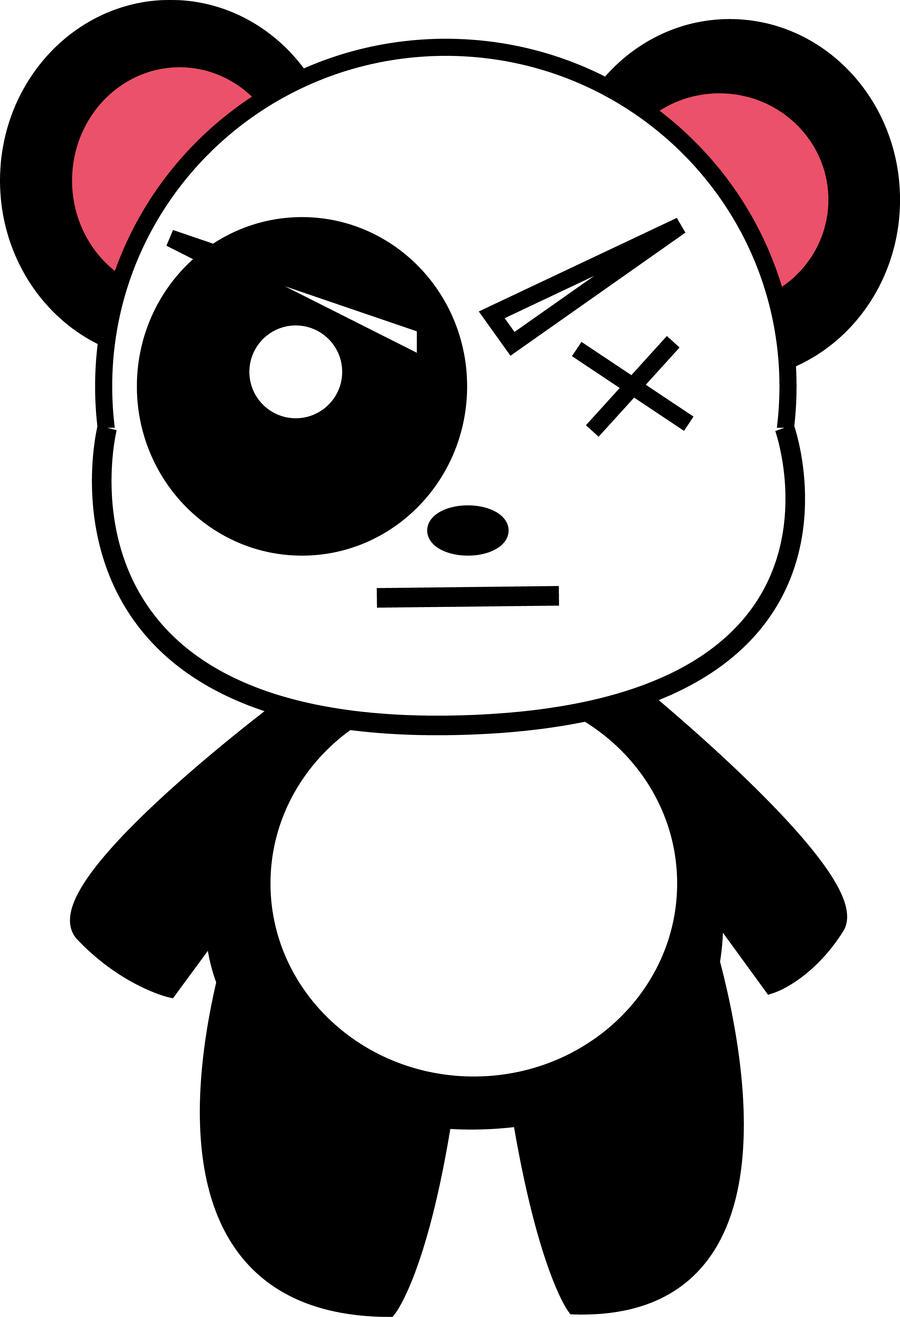 BATSU PANDA by shidozaki